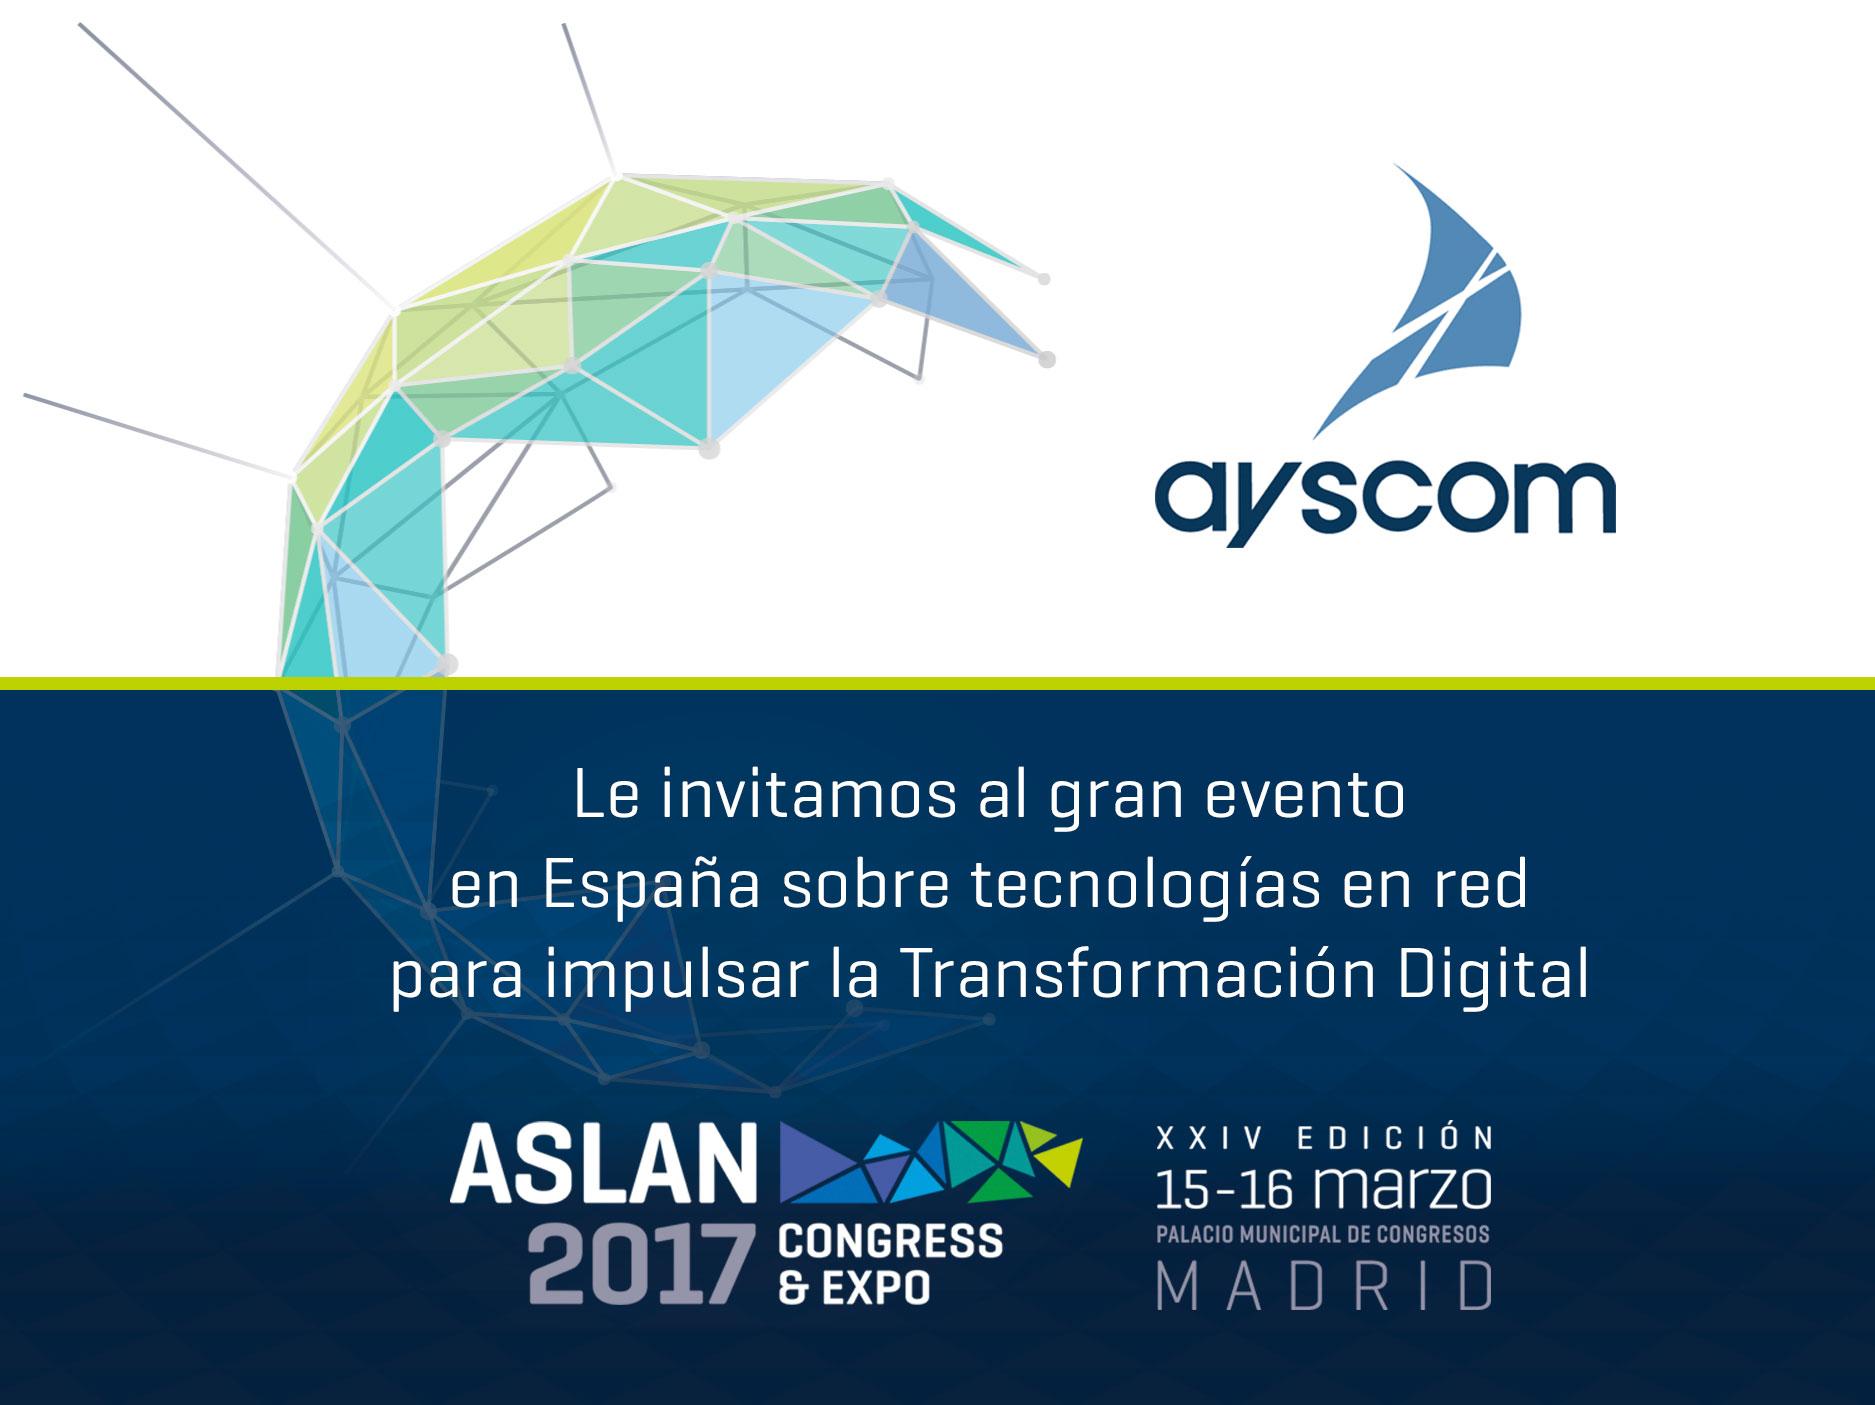 Ayscom participa en Expo & Congress Aslan 2017